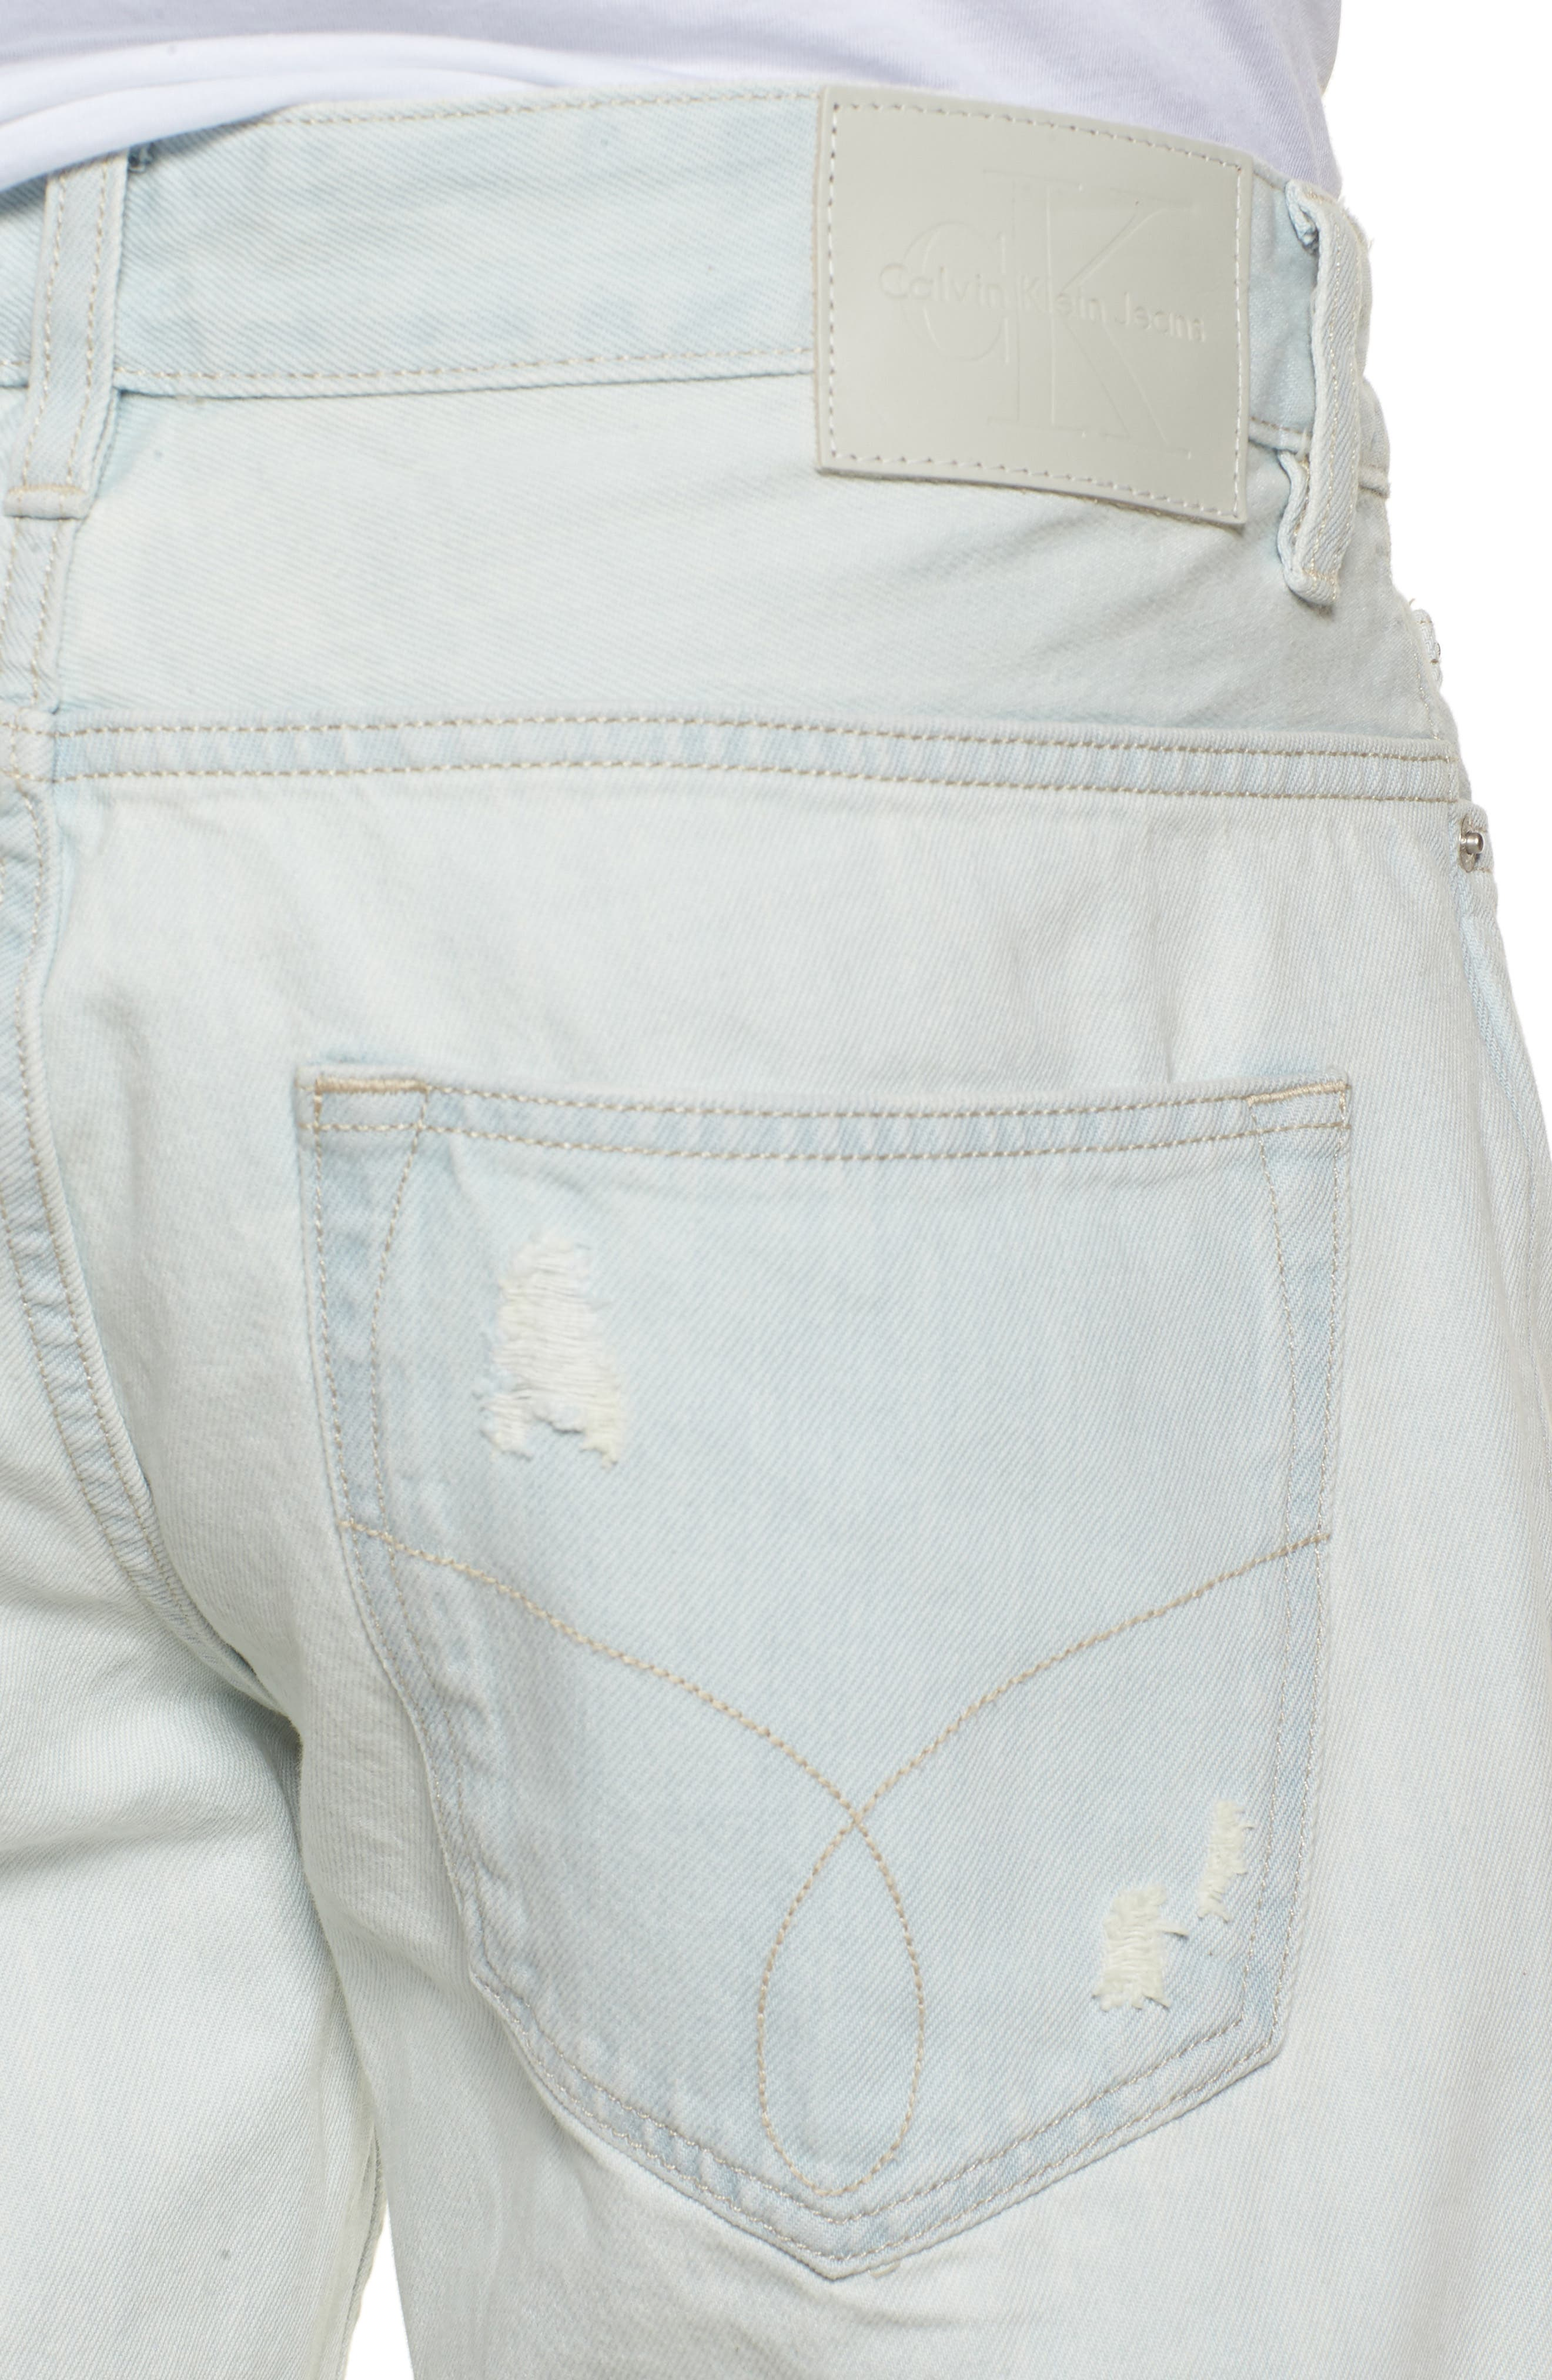 Slim Jeans,                             Alternate thumbnail 4, color,                             400